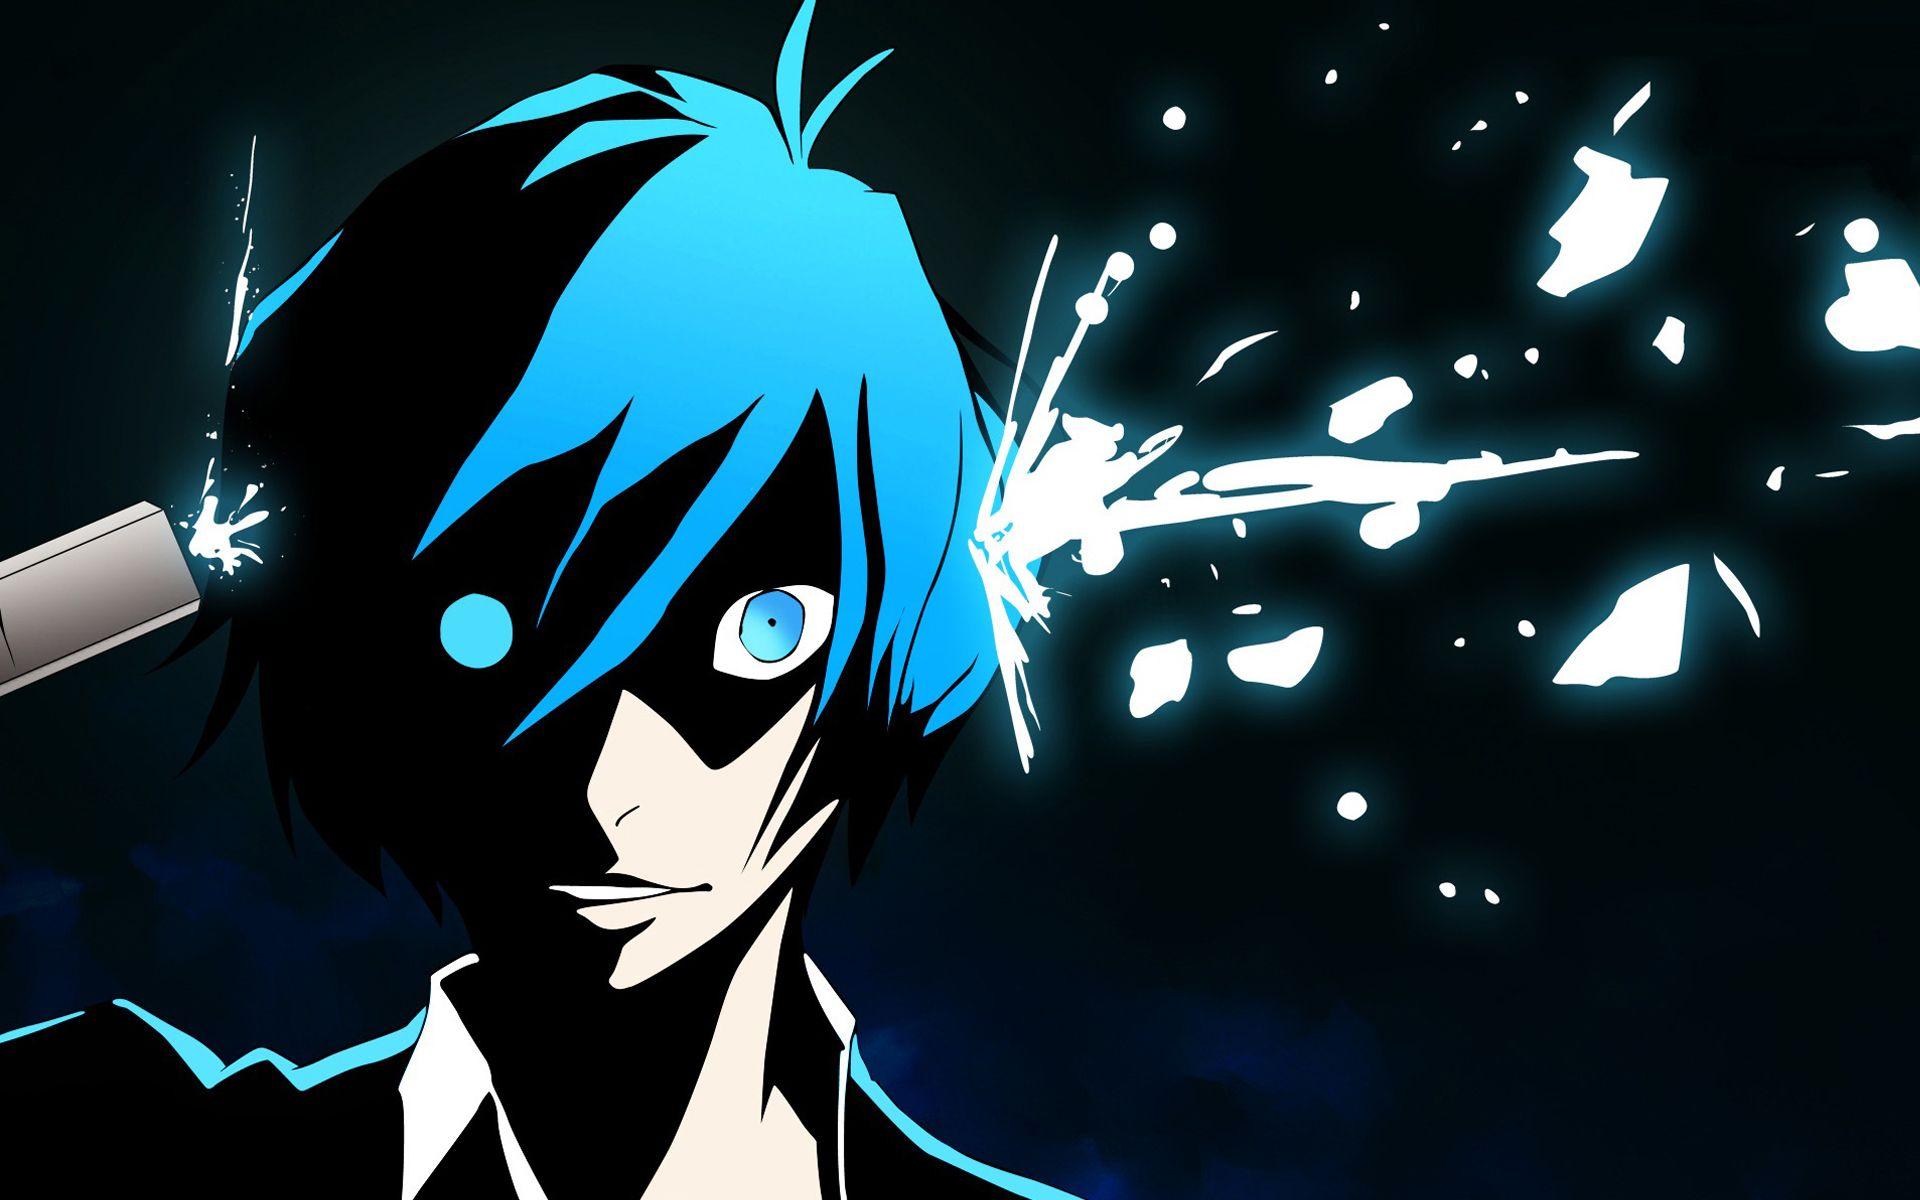 flirting games anime eyes images hd wallpaper